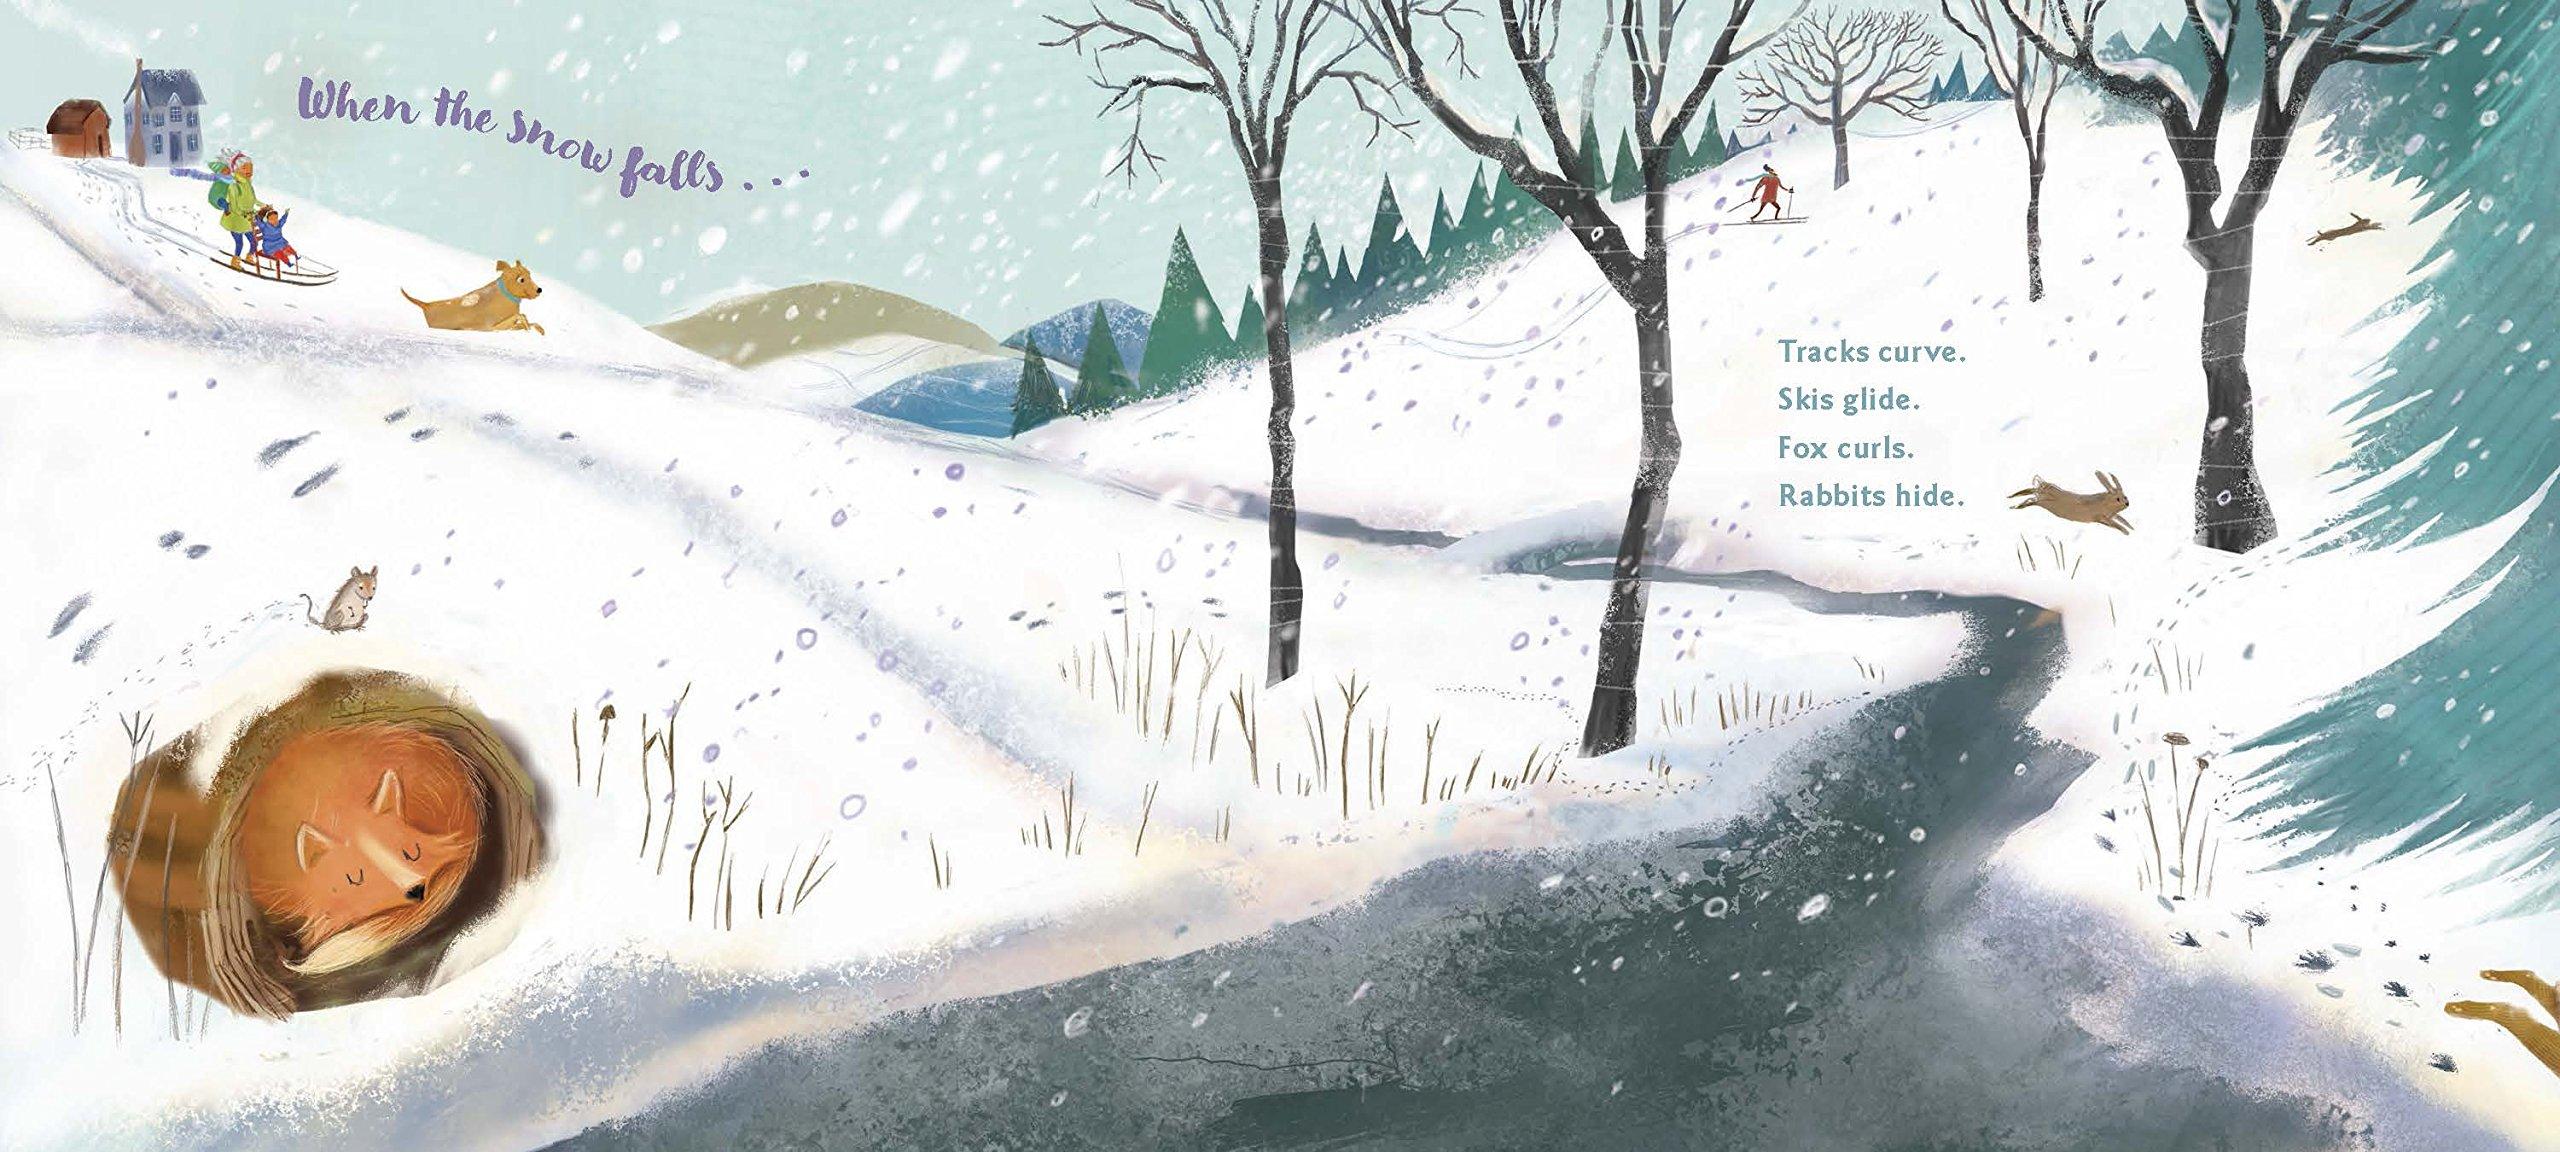 celebrate-picture-books-picture-book-review-when-the-snow-falls-fox